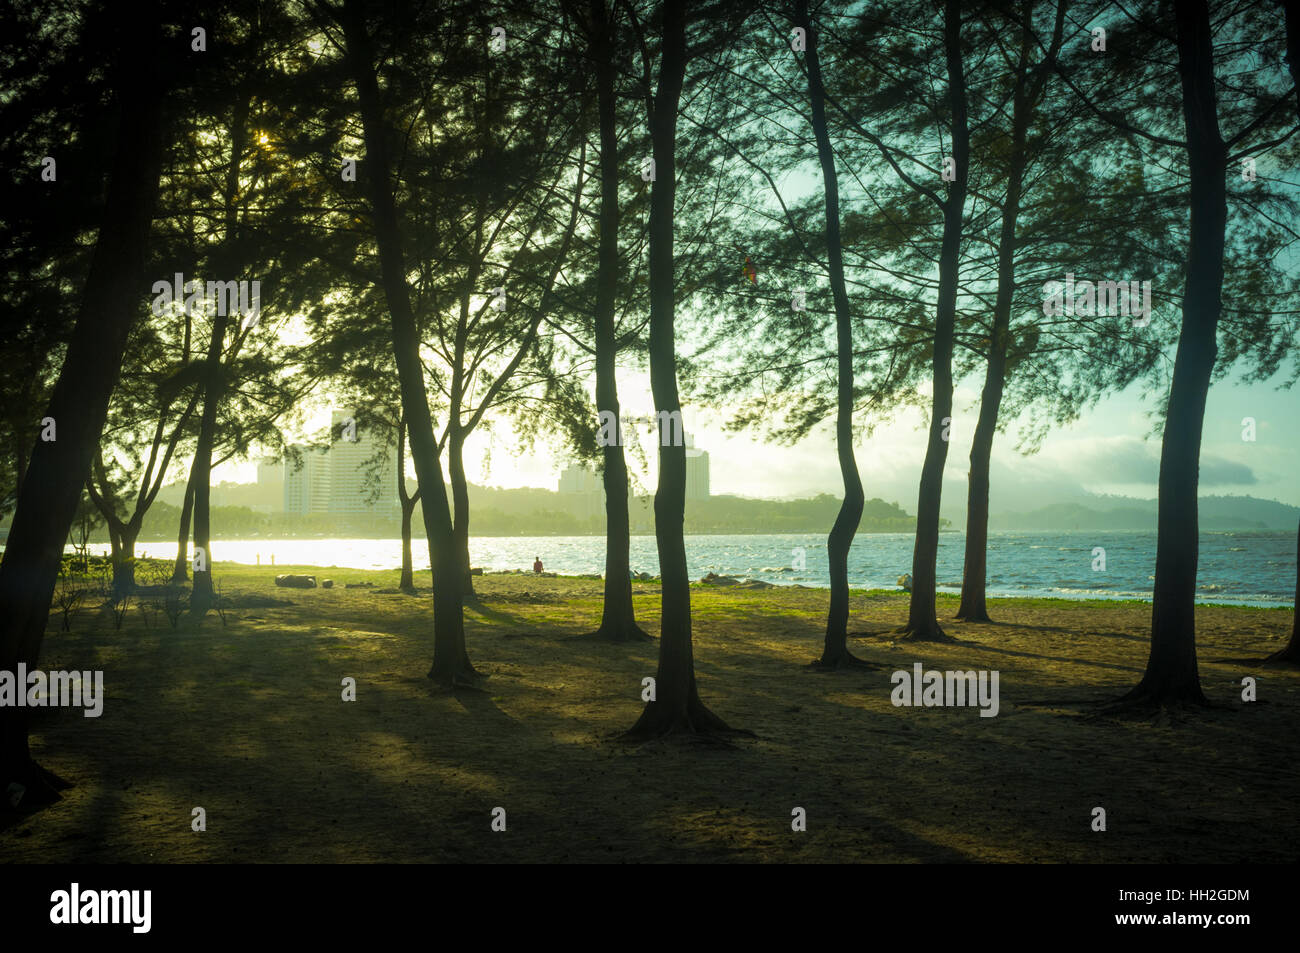 Beach with trees, Kota Kinabalu, Sabah, Malaysian Borneo - Stock Image